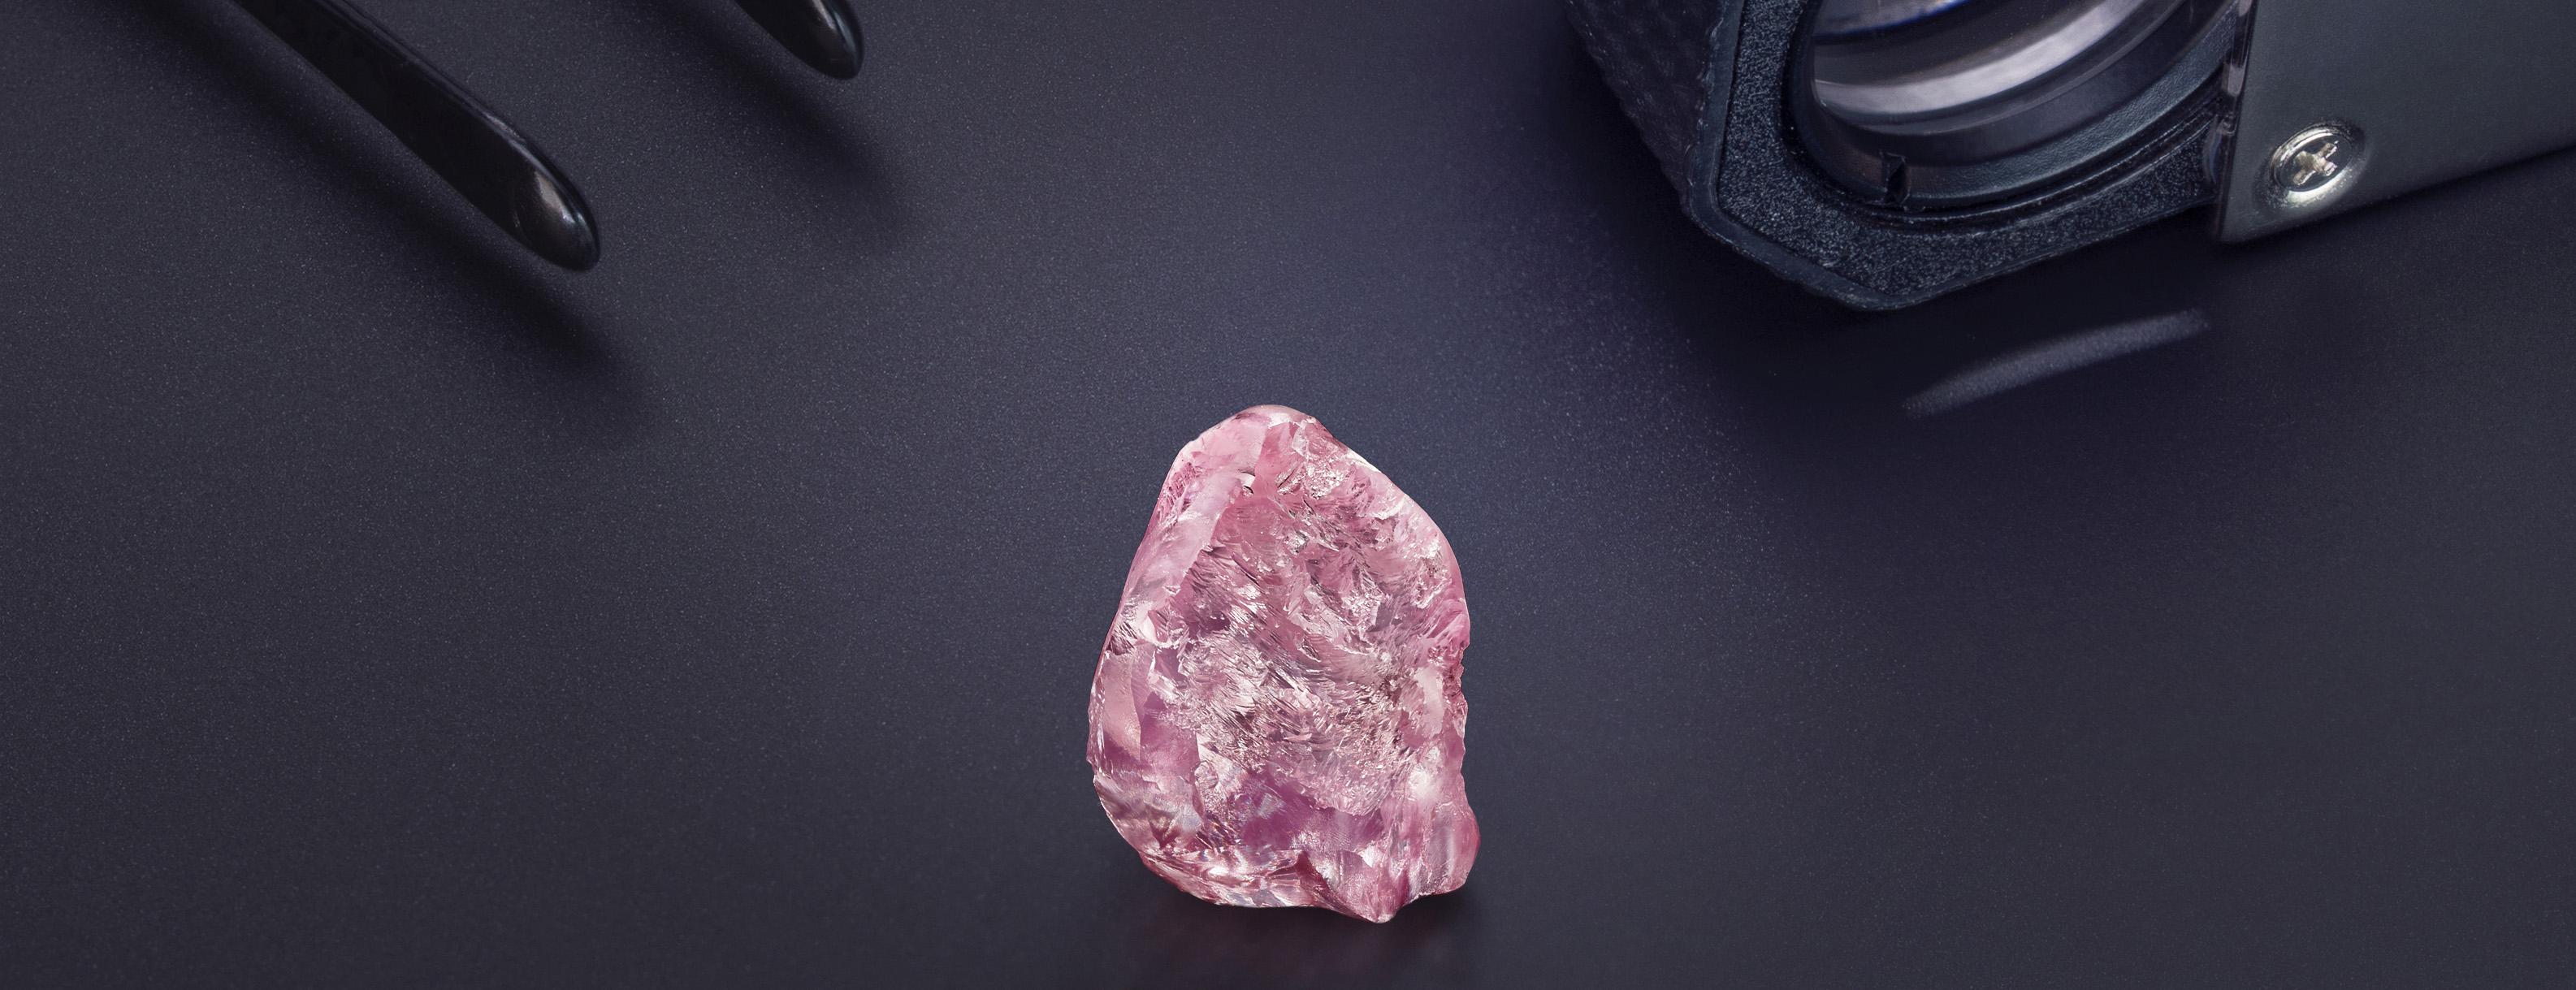 Graff Lesotho Pink 13.33ct pink diamond